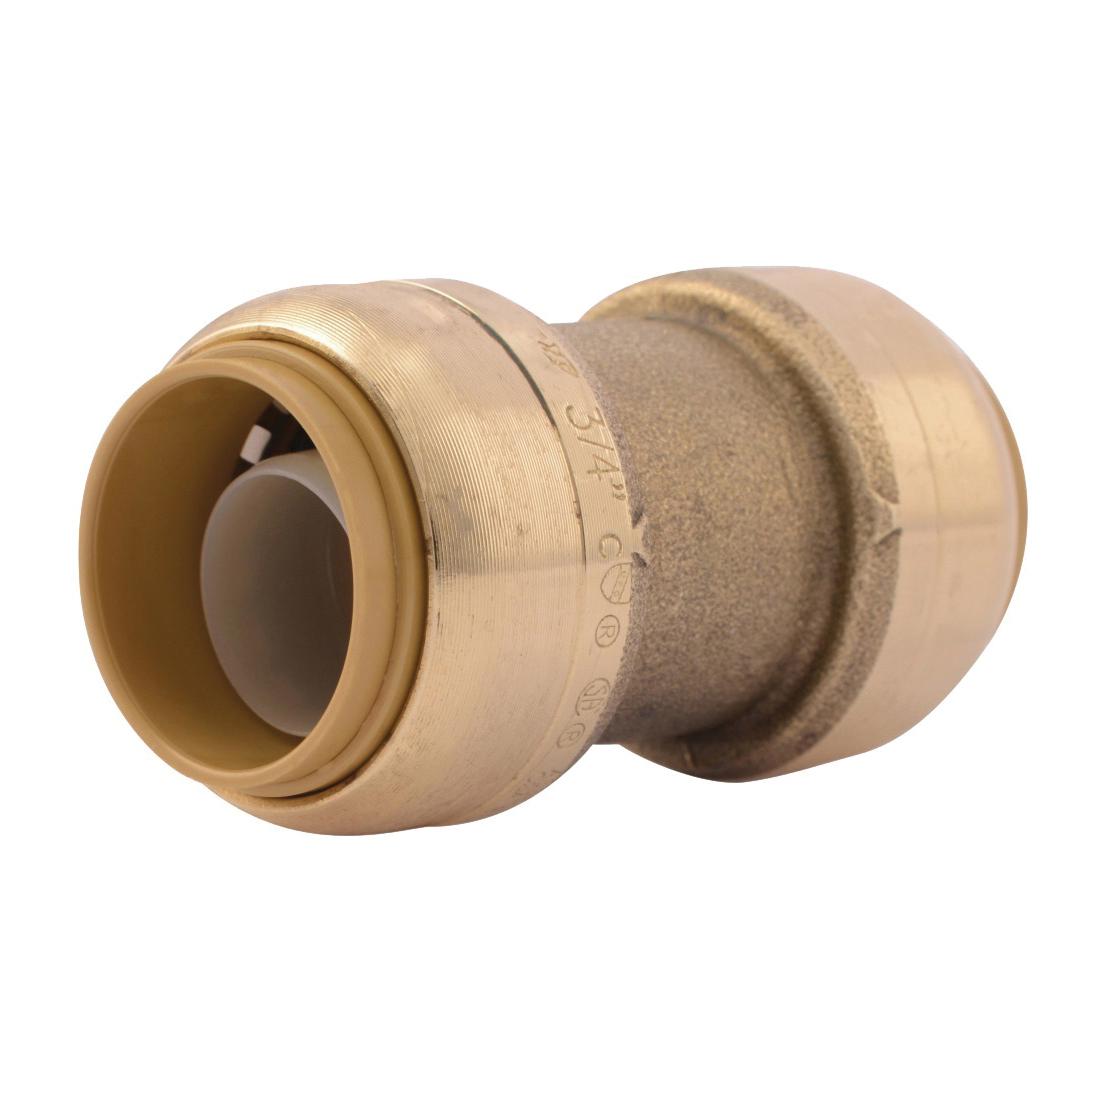 Picture of SharkBite U016LFA Tube Coupler, 3/4 in, Brass, 200 psi Pressure